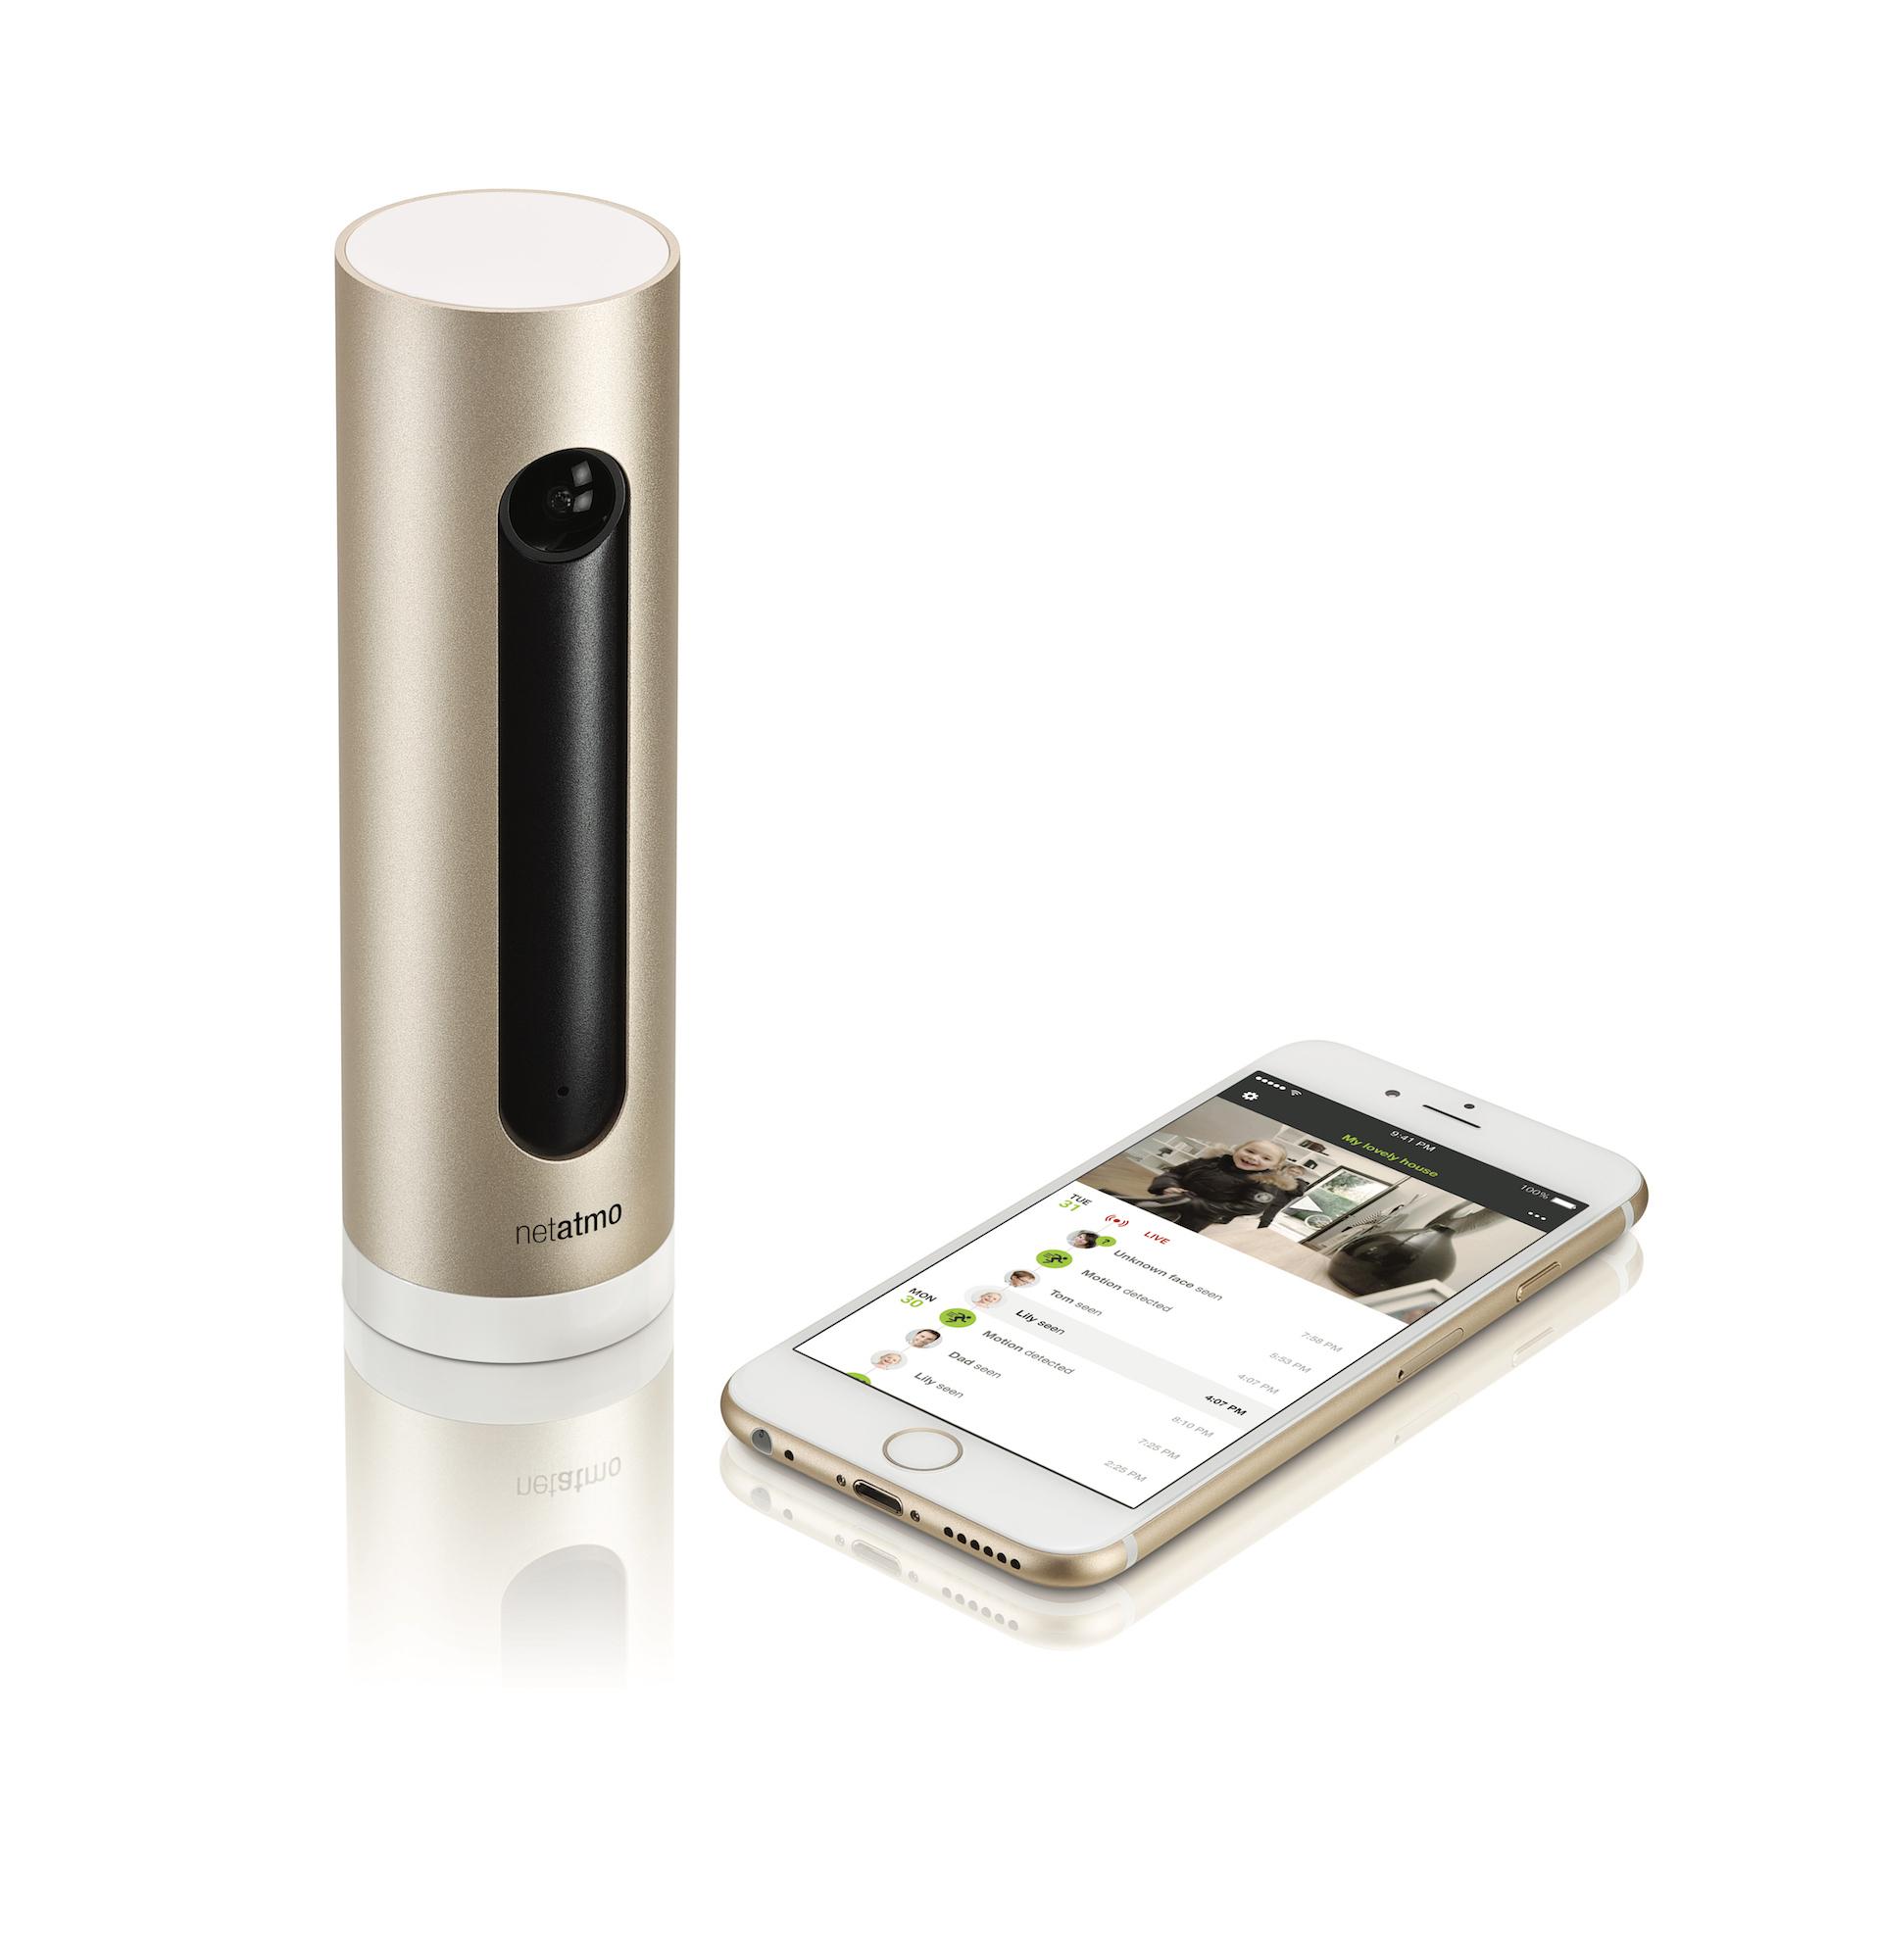 Camera & iPhone 6 HD-PRINT